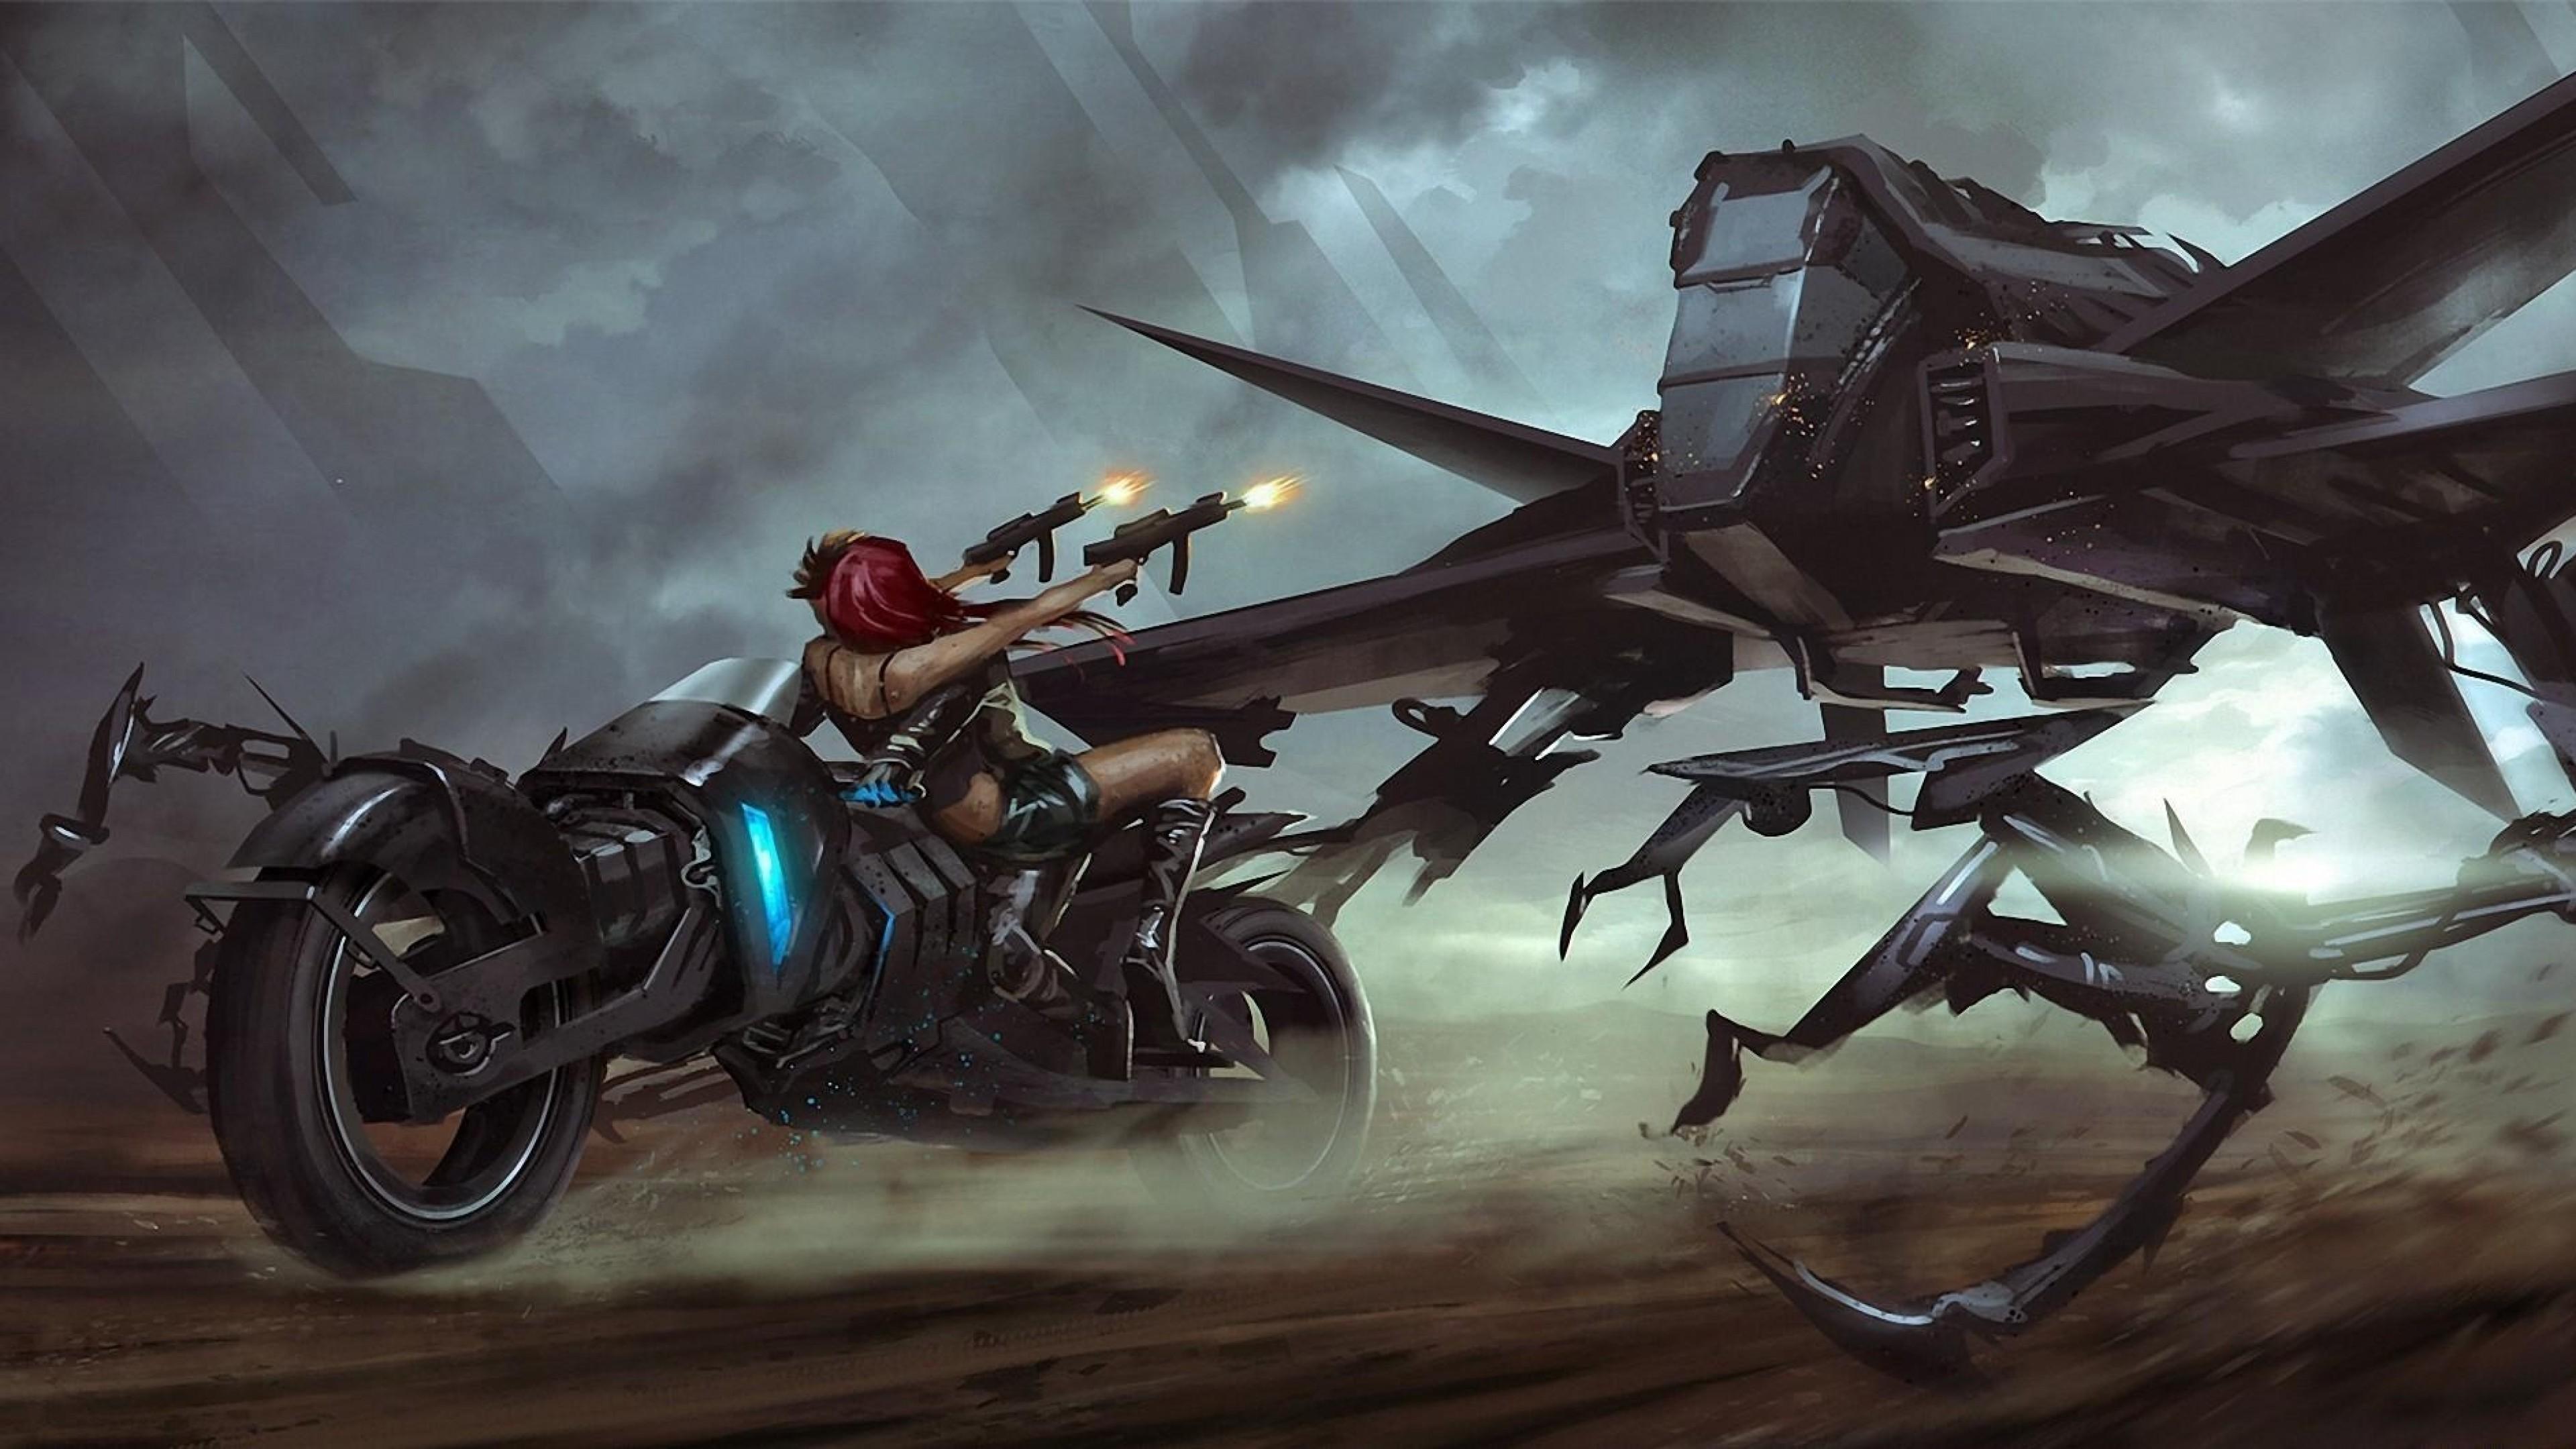 Wallpaper girl, motorcycle, guns, reflection, robot, monster